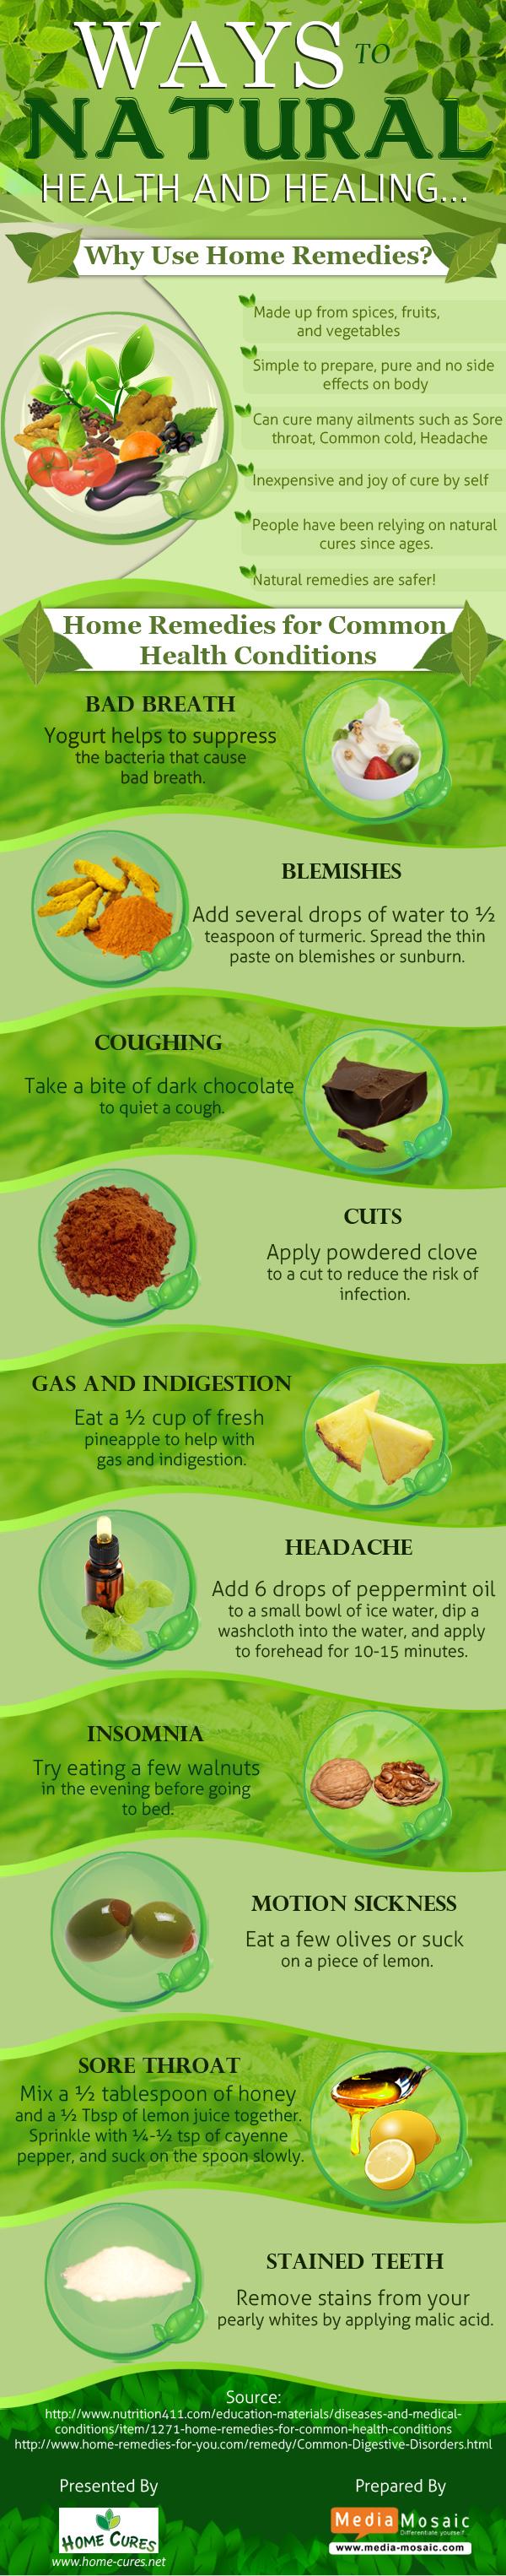 Ways To Natural Health and Healing